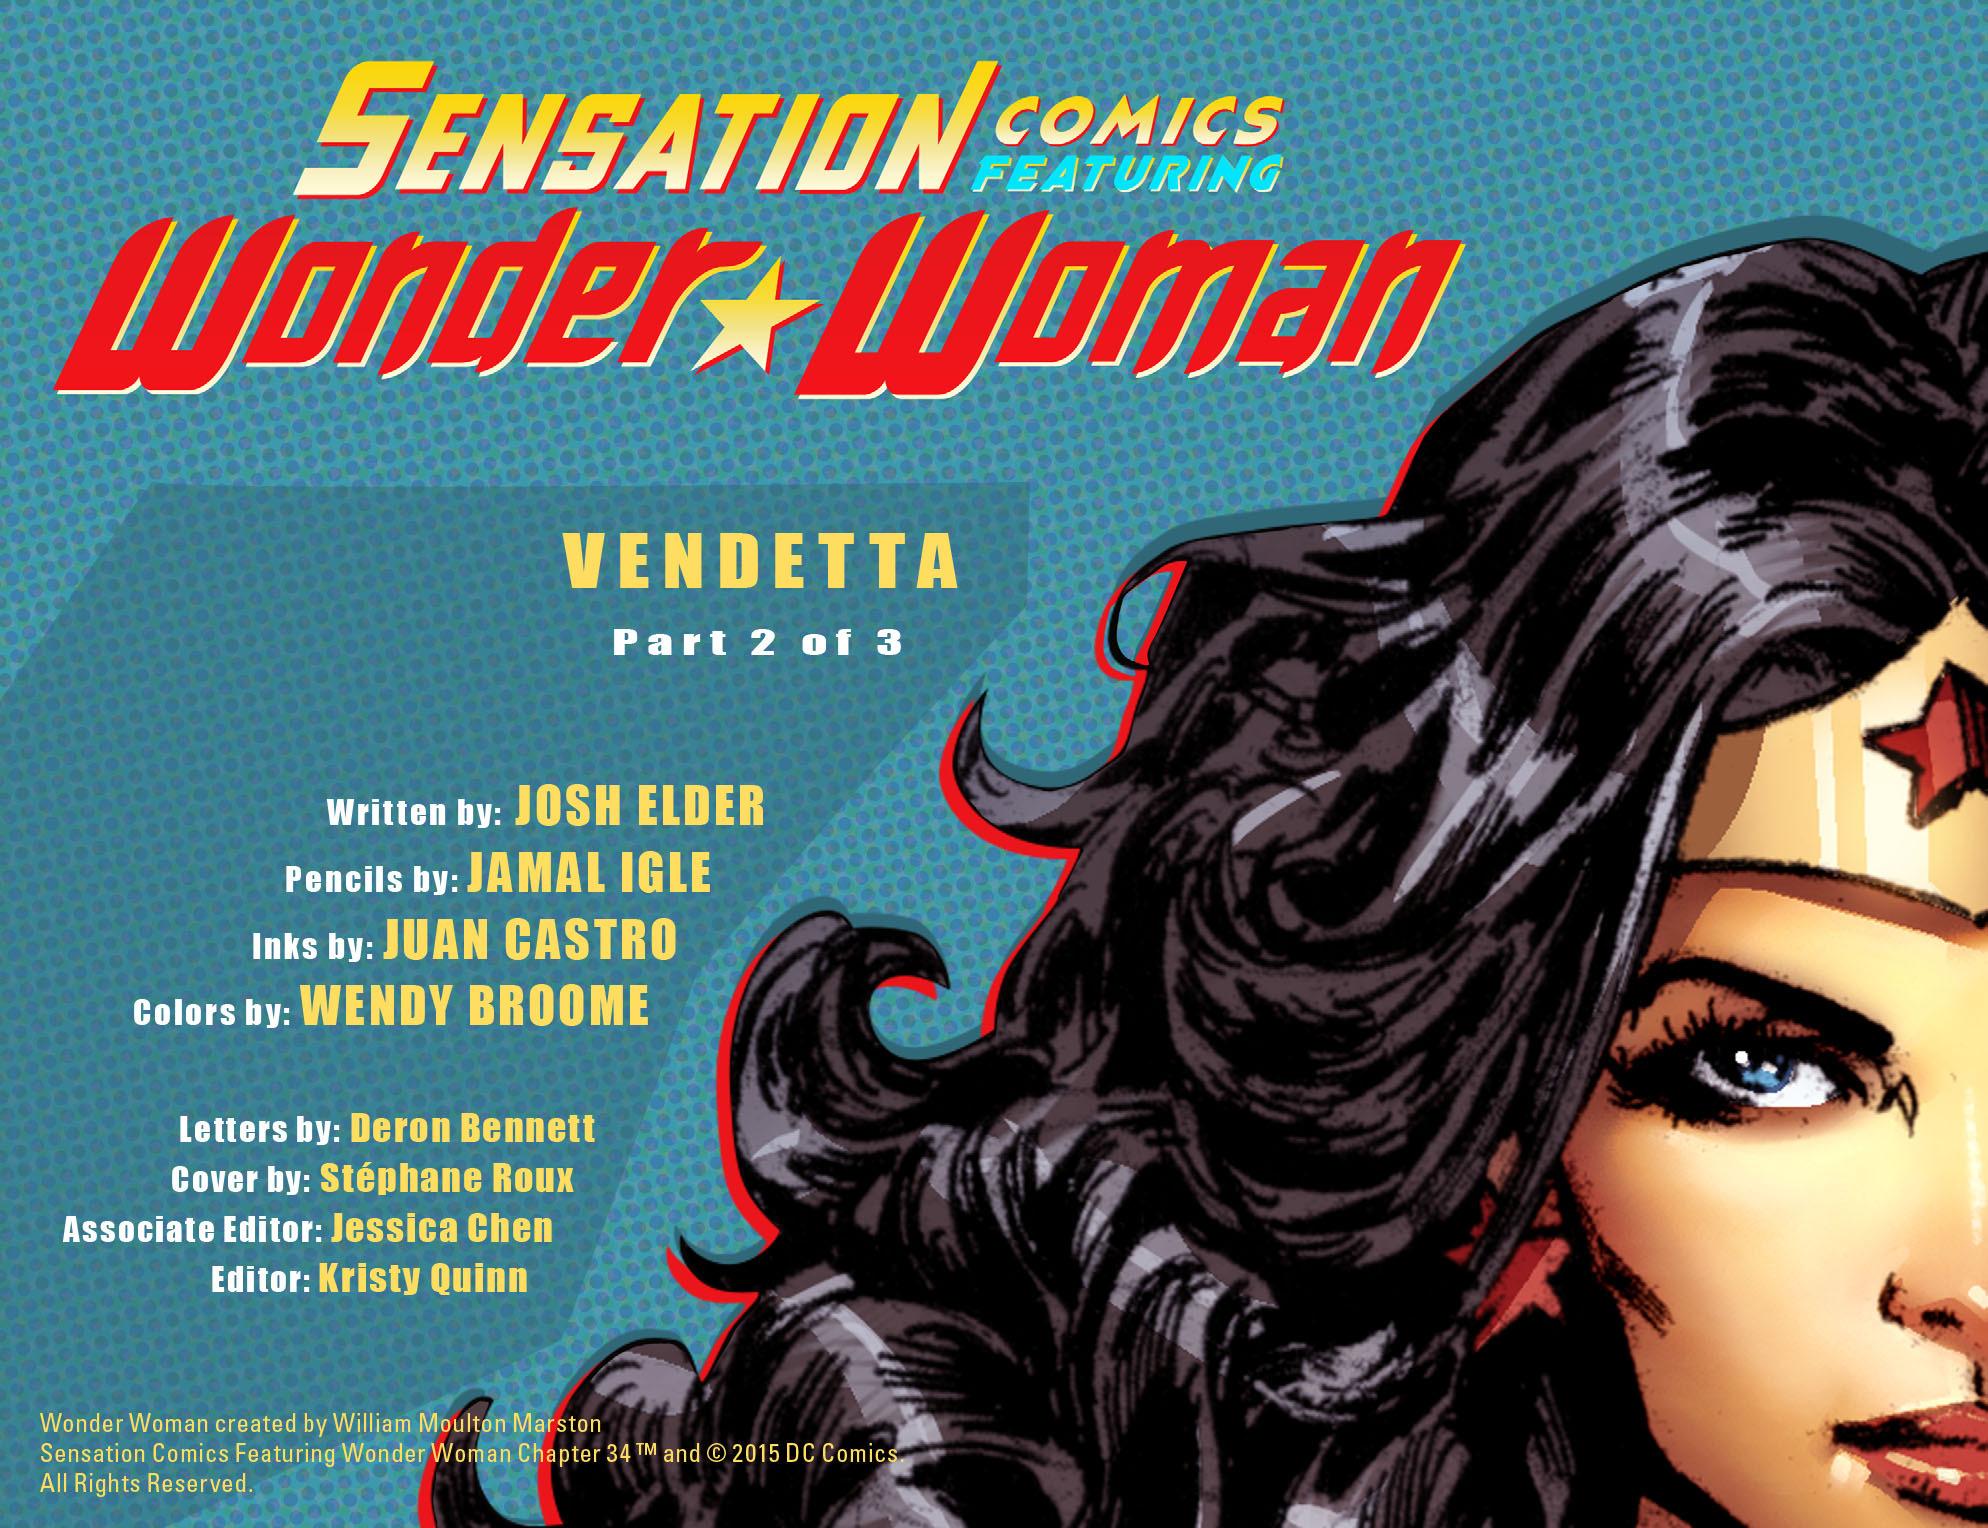 Read online Sensation Comics Featuring Wonder Woman comic -  Issue #34 - 2